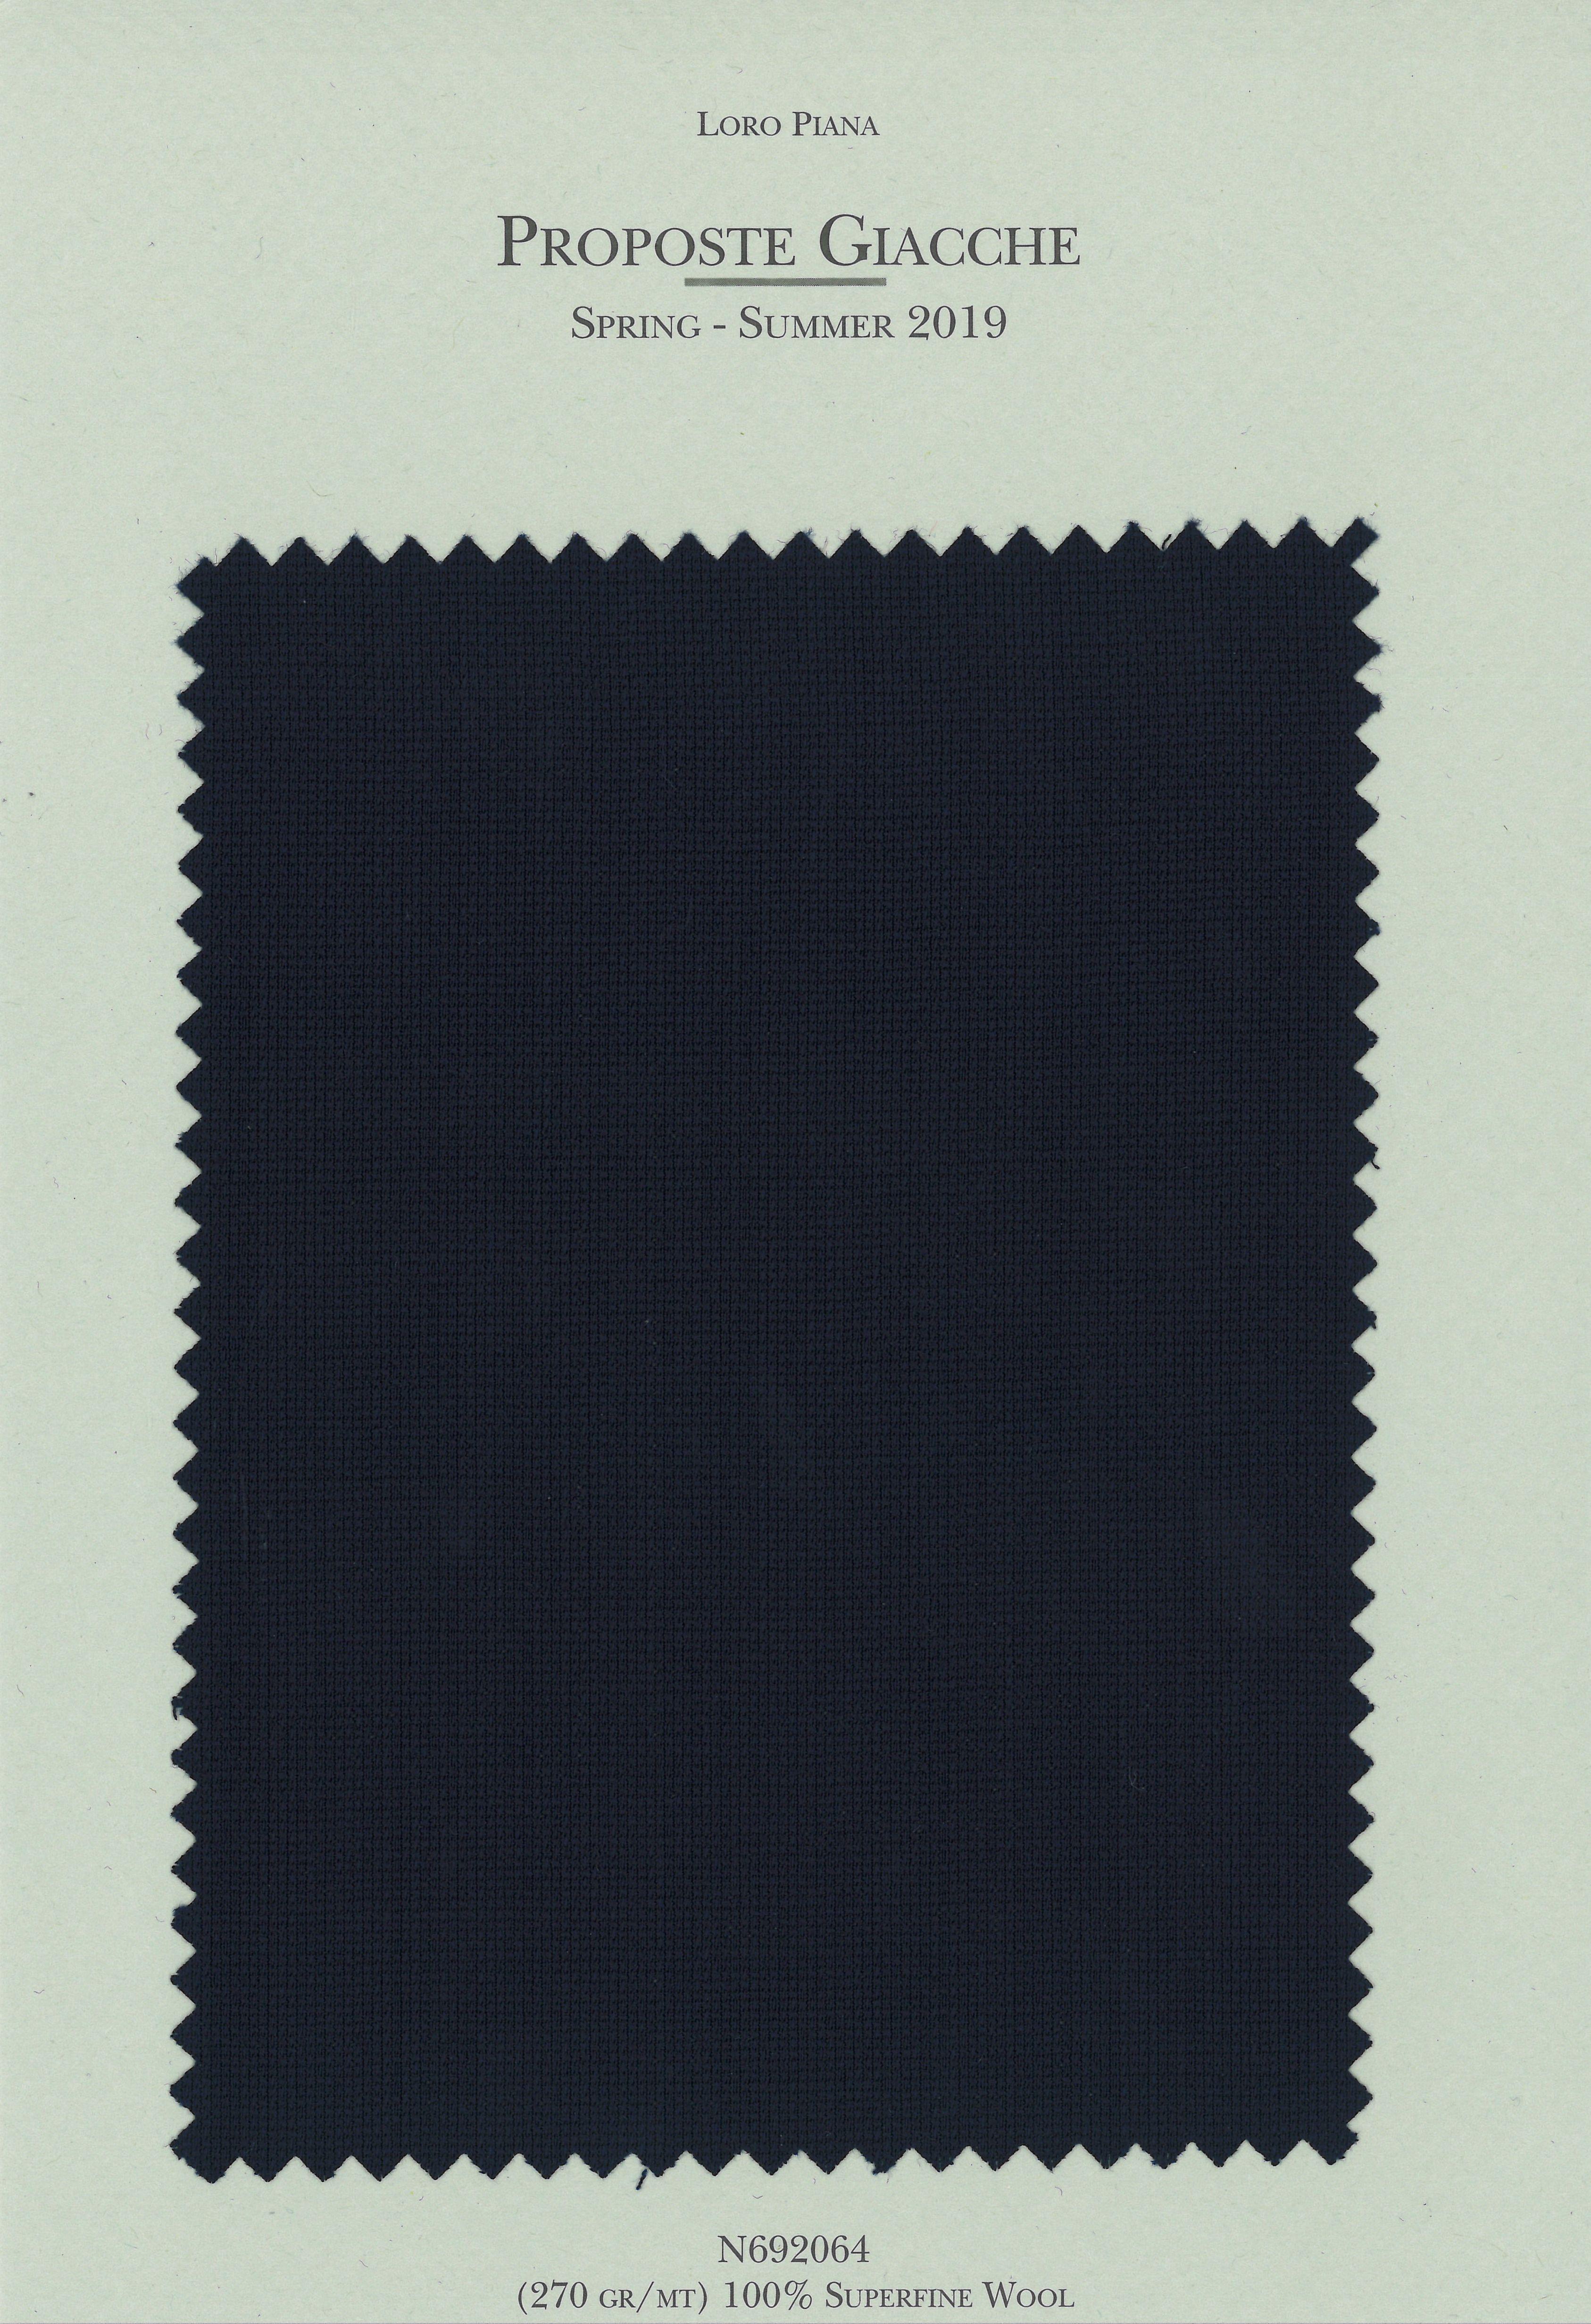 N692064